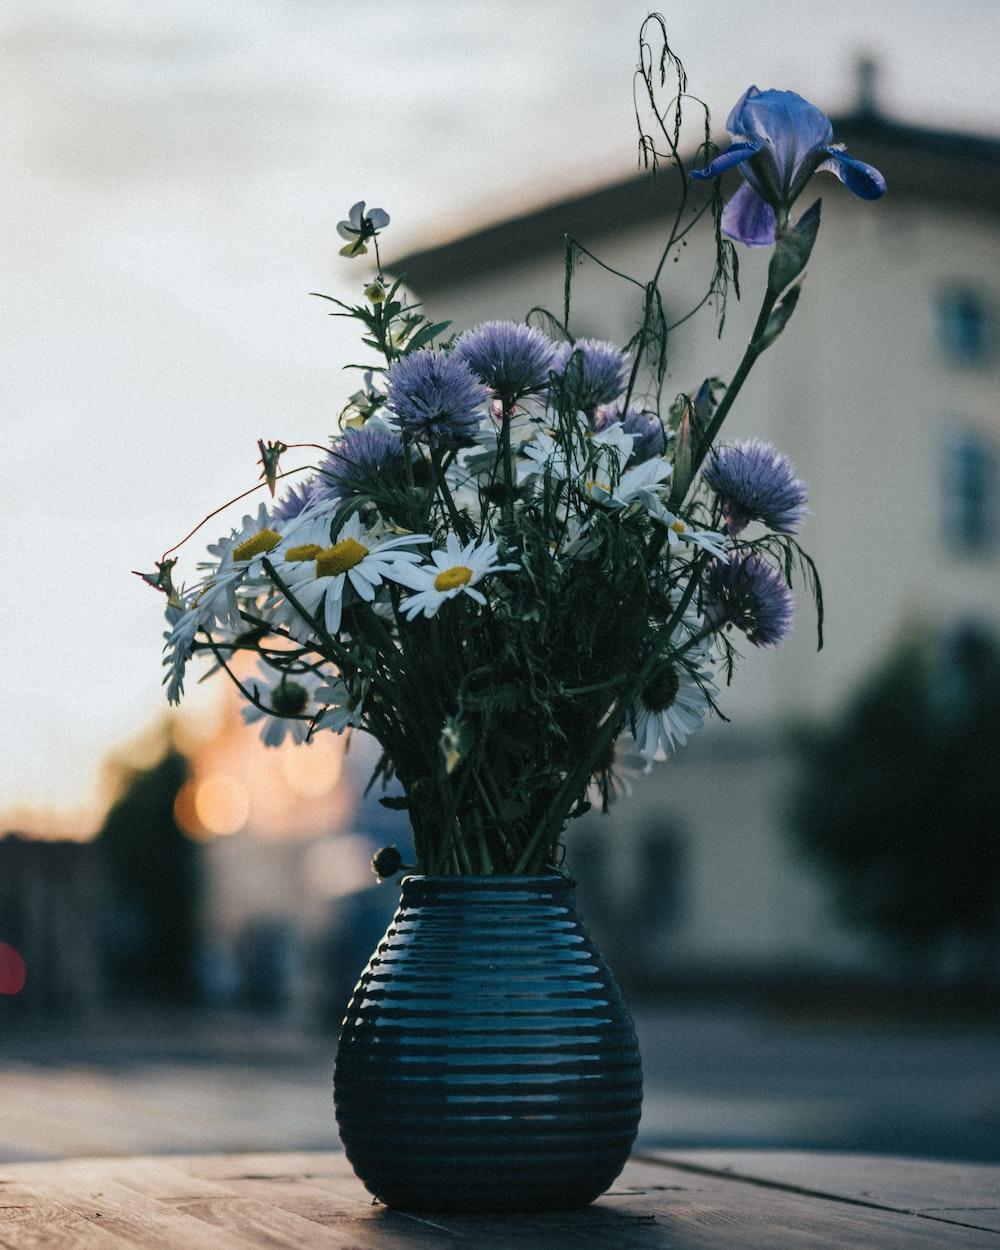 blue flowers in blue ceramic vase